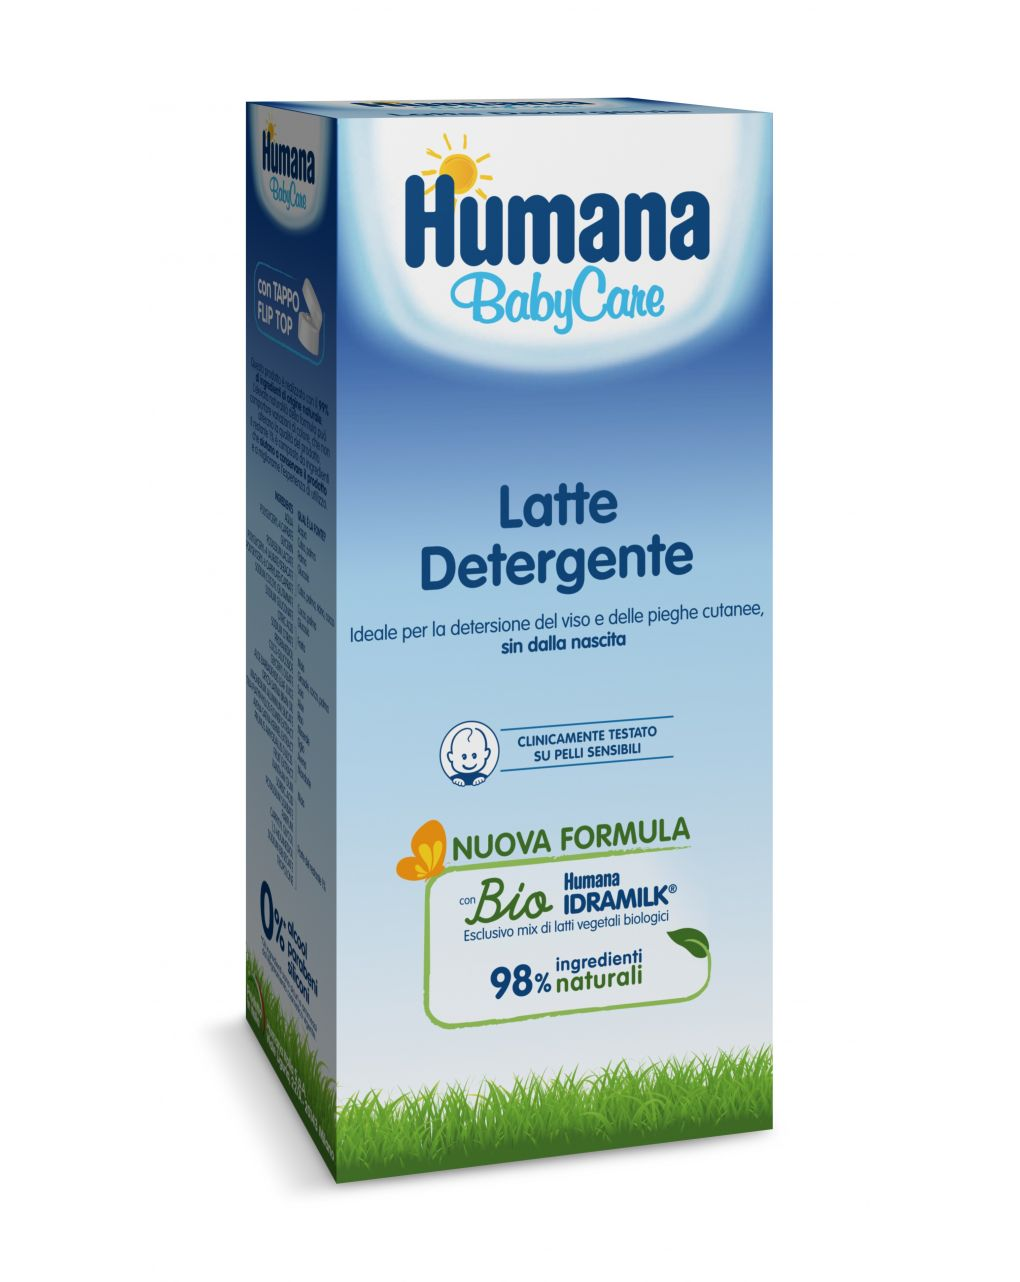 Latte detergente 300 ml - Humana Baby Care